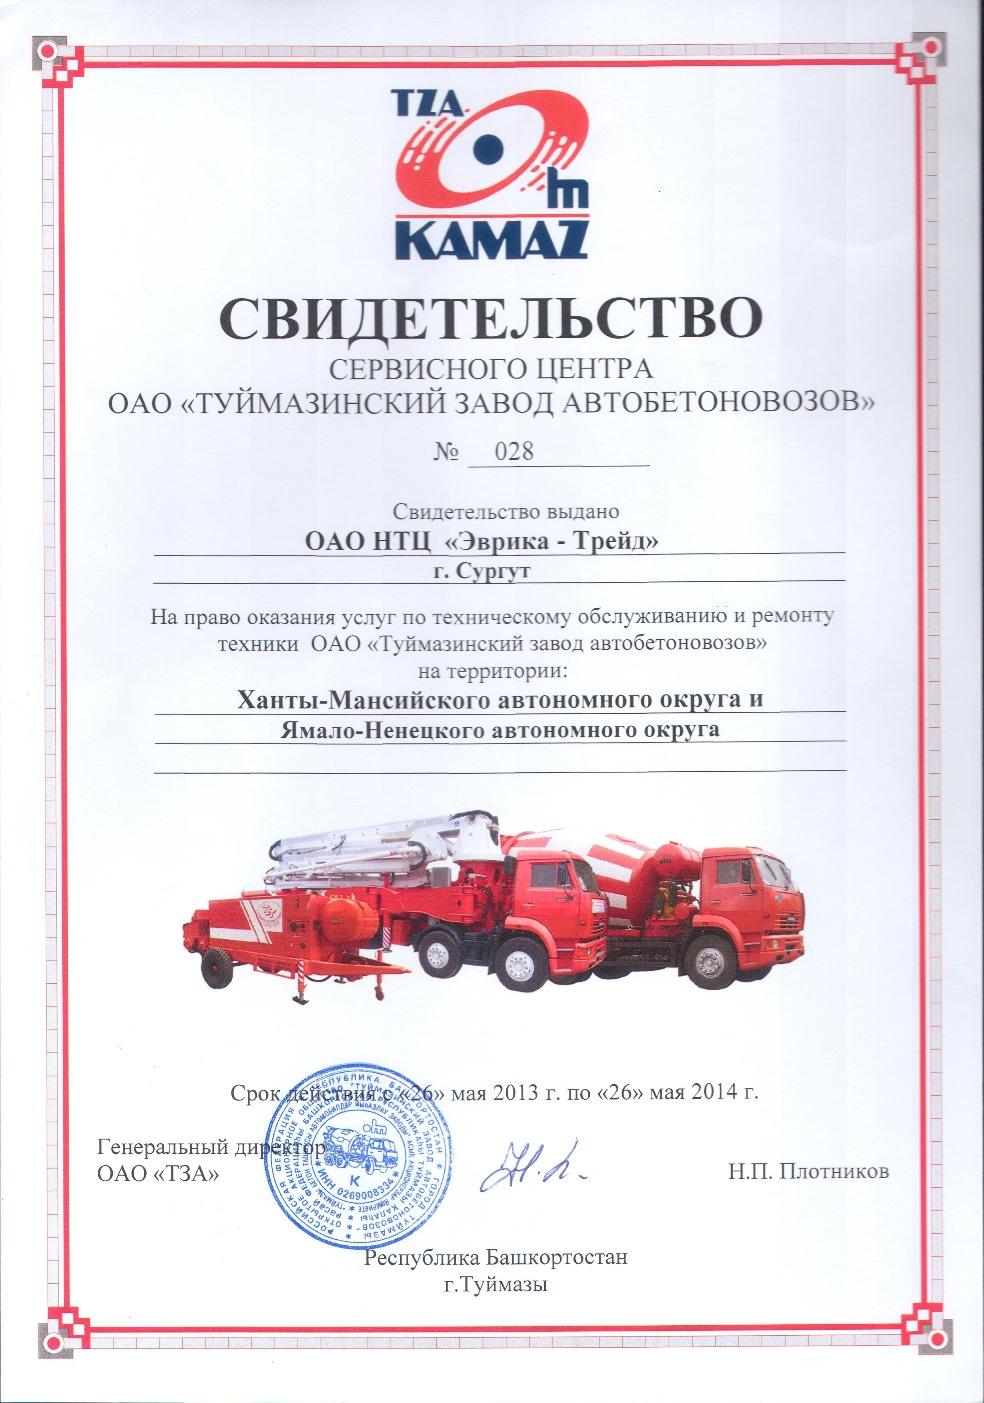 Сертификат на ремонт Камаз